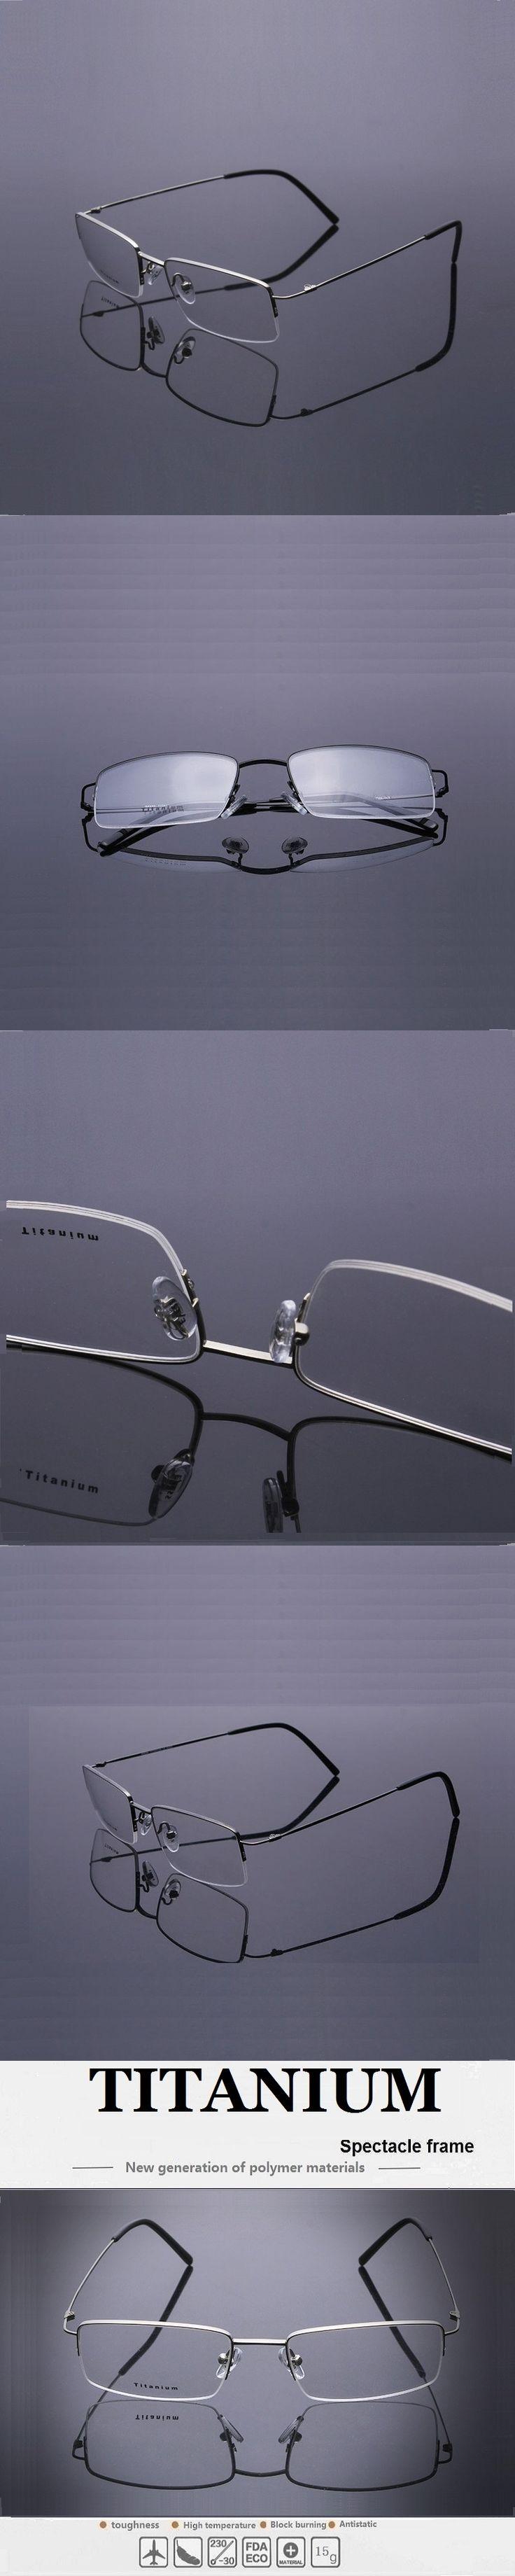 52-18-140 new men's business  titanium spectacle frame half frame myopia spectacles frame 8995 lentes opticos  free shipping